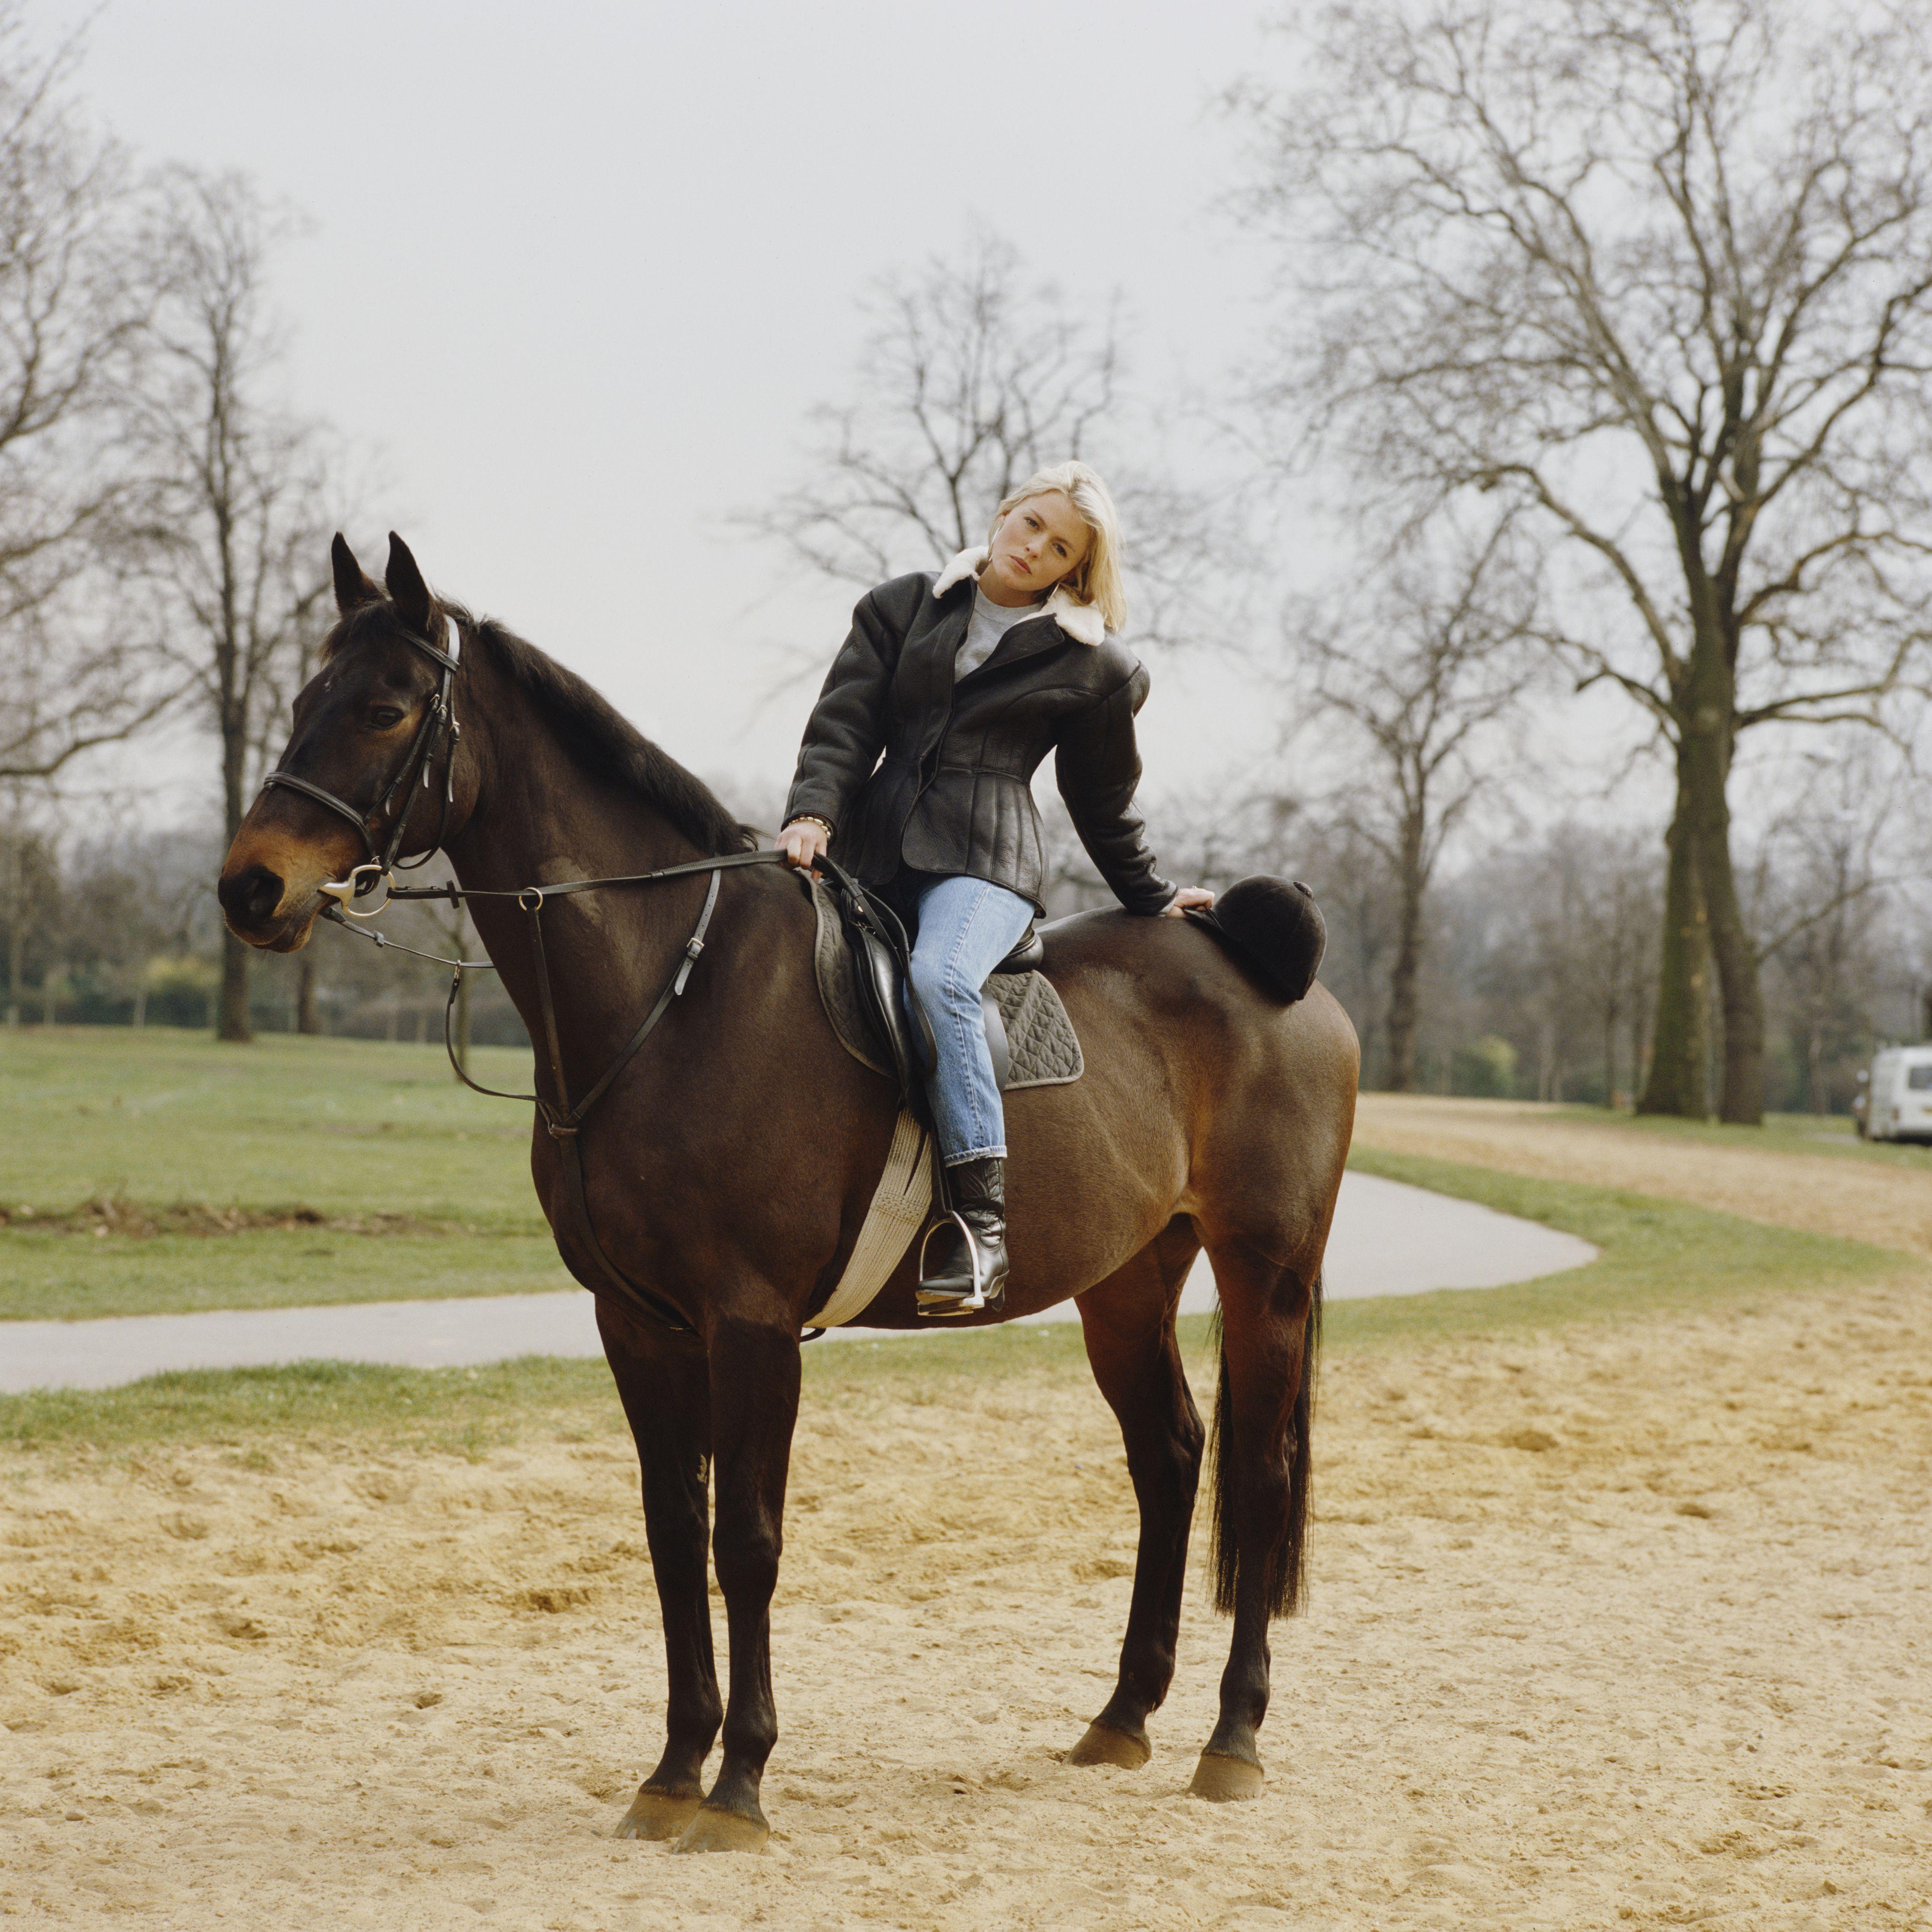 English Actress and Singer Patsy Kensit Sitting on a Horse, Circa 1995